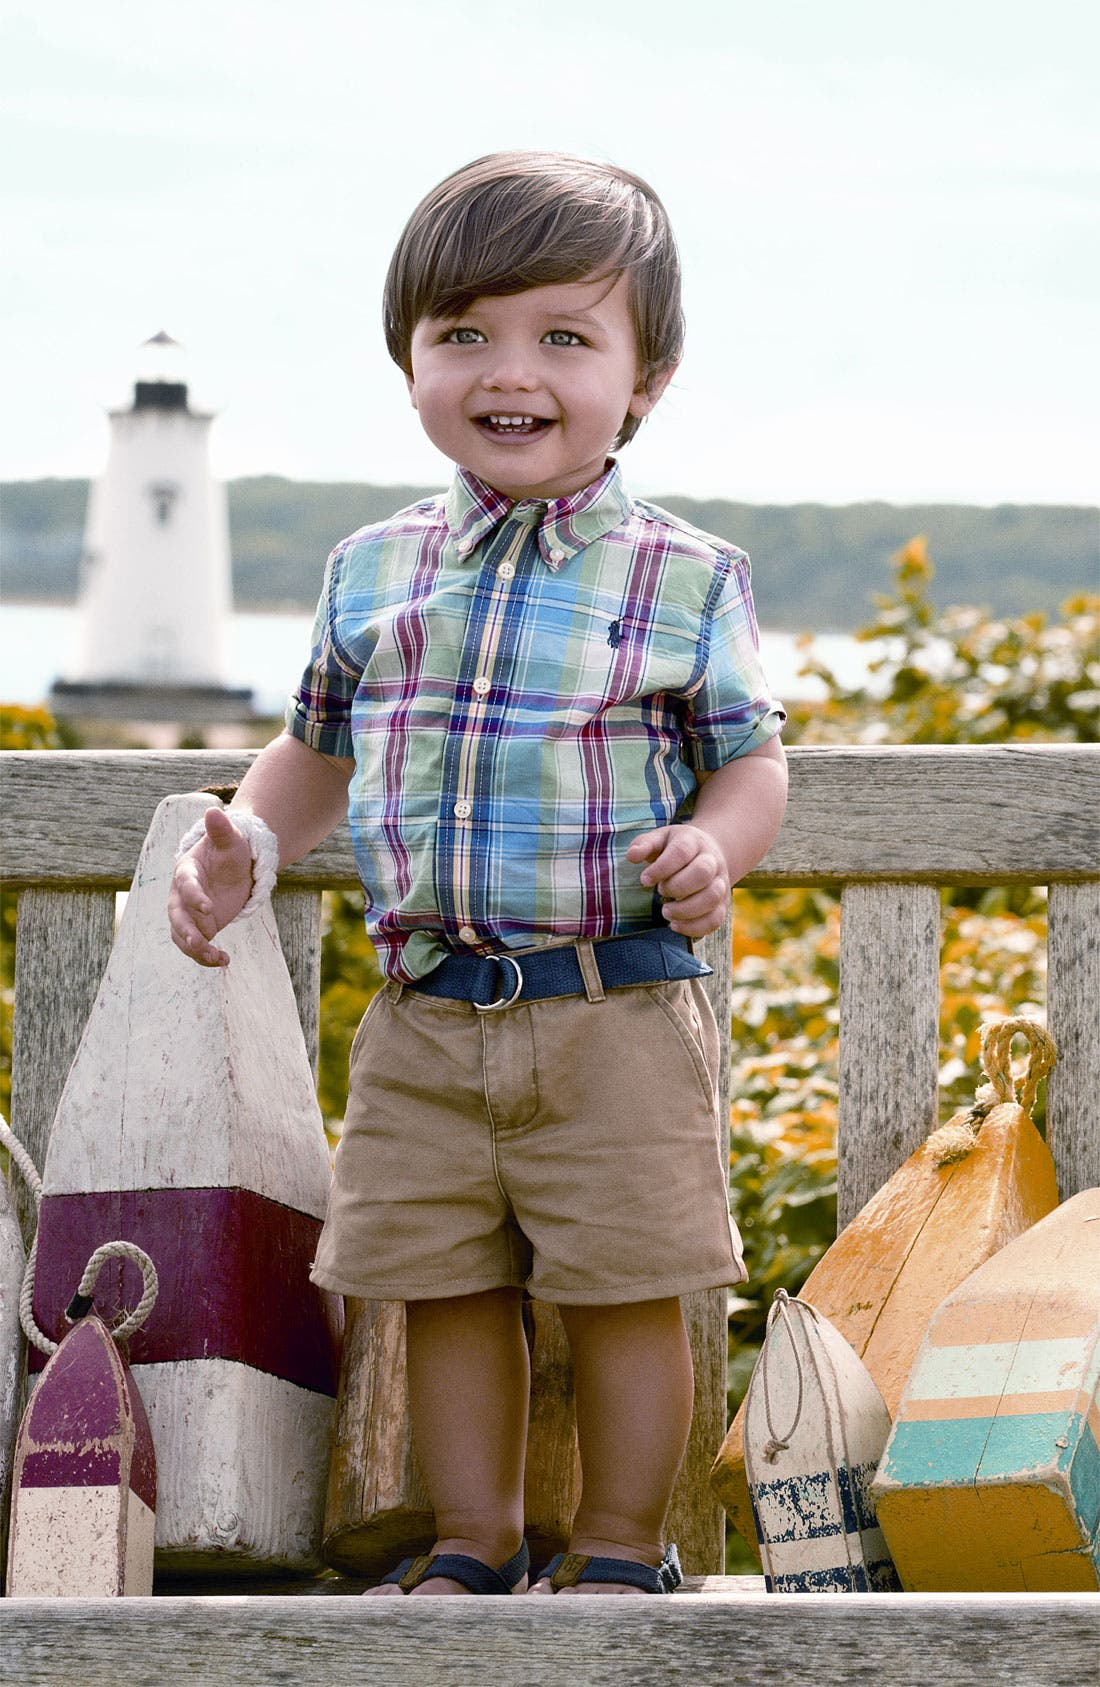 Main Image - Ralph Lauren Shirt, Shorts & Boat Shoe (Infant)